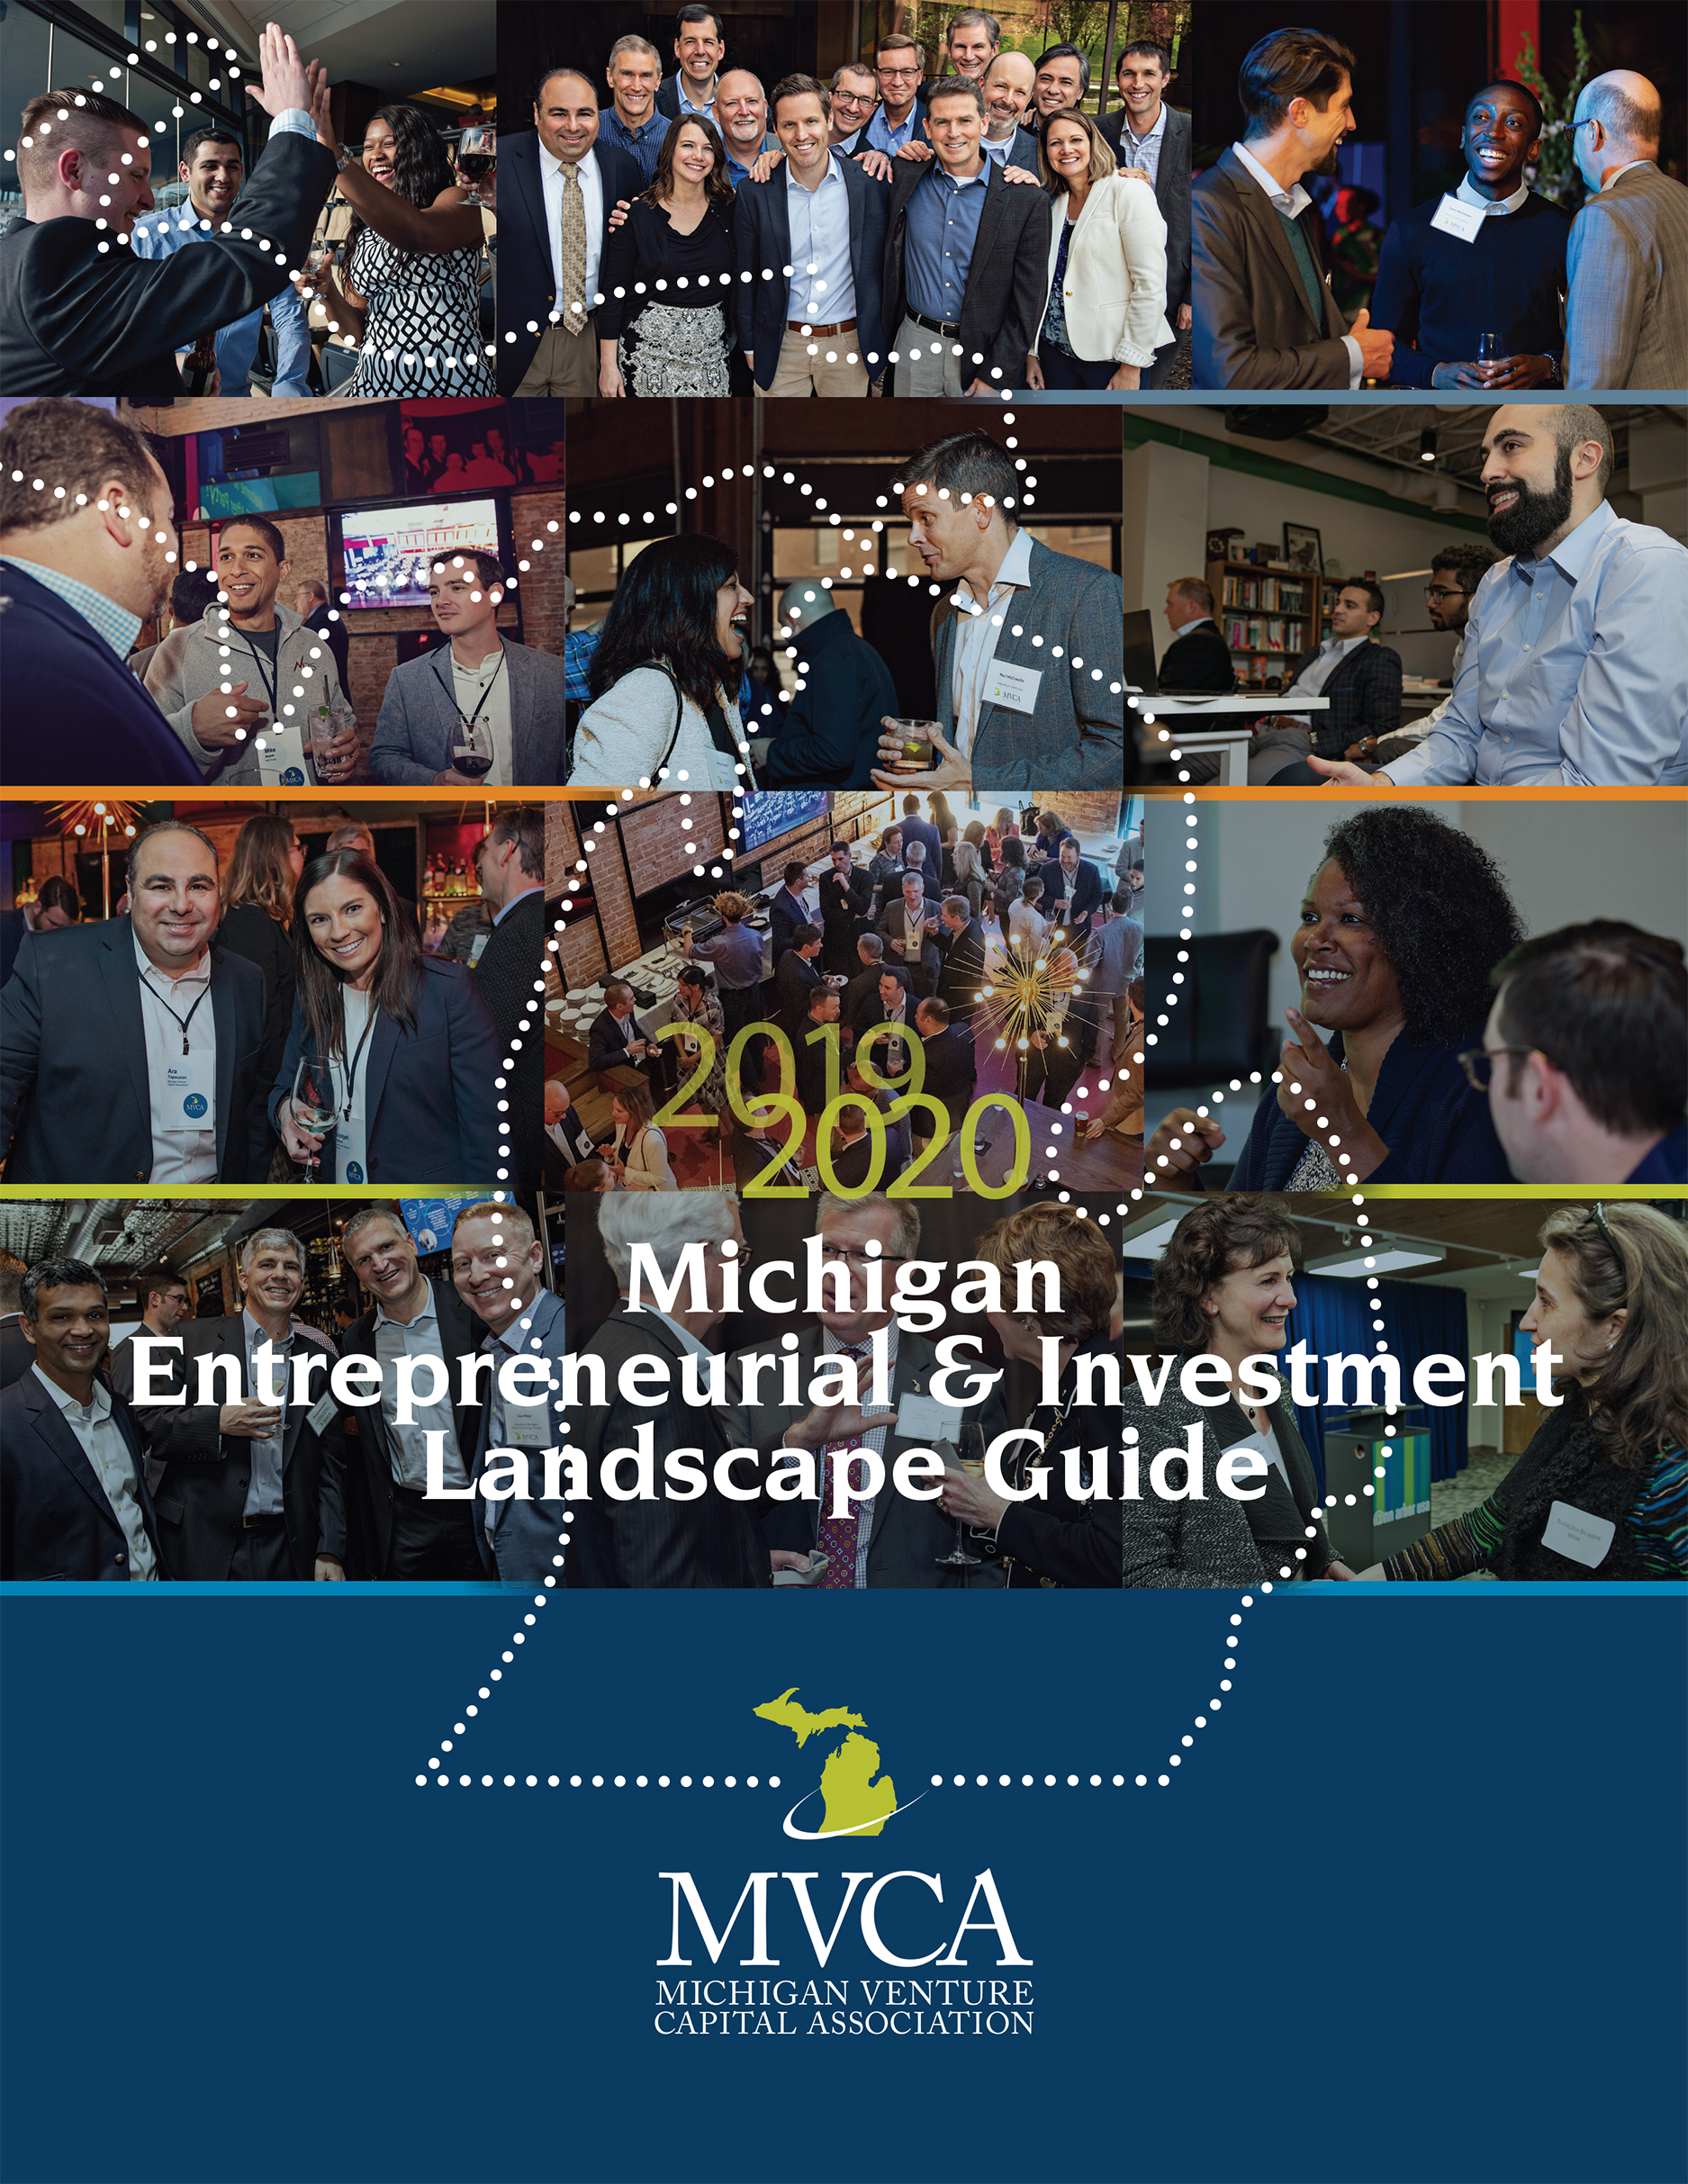 Michigan Entrepreneurial & Investment Landscape Guide